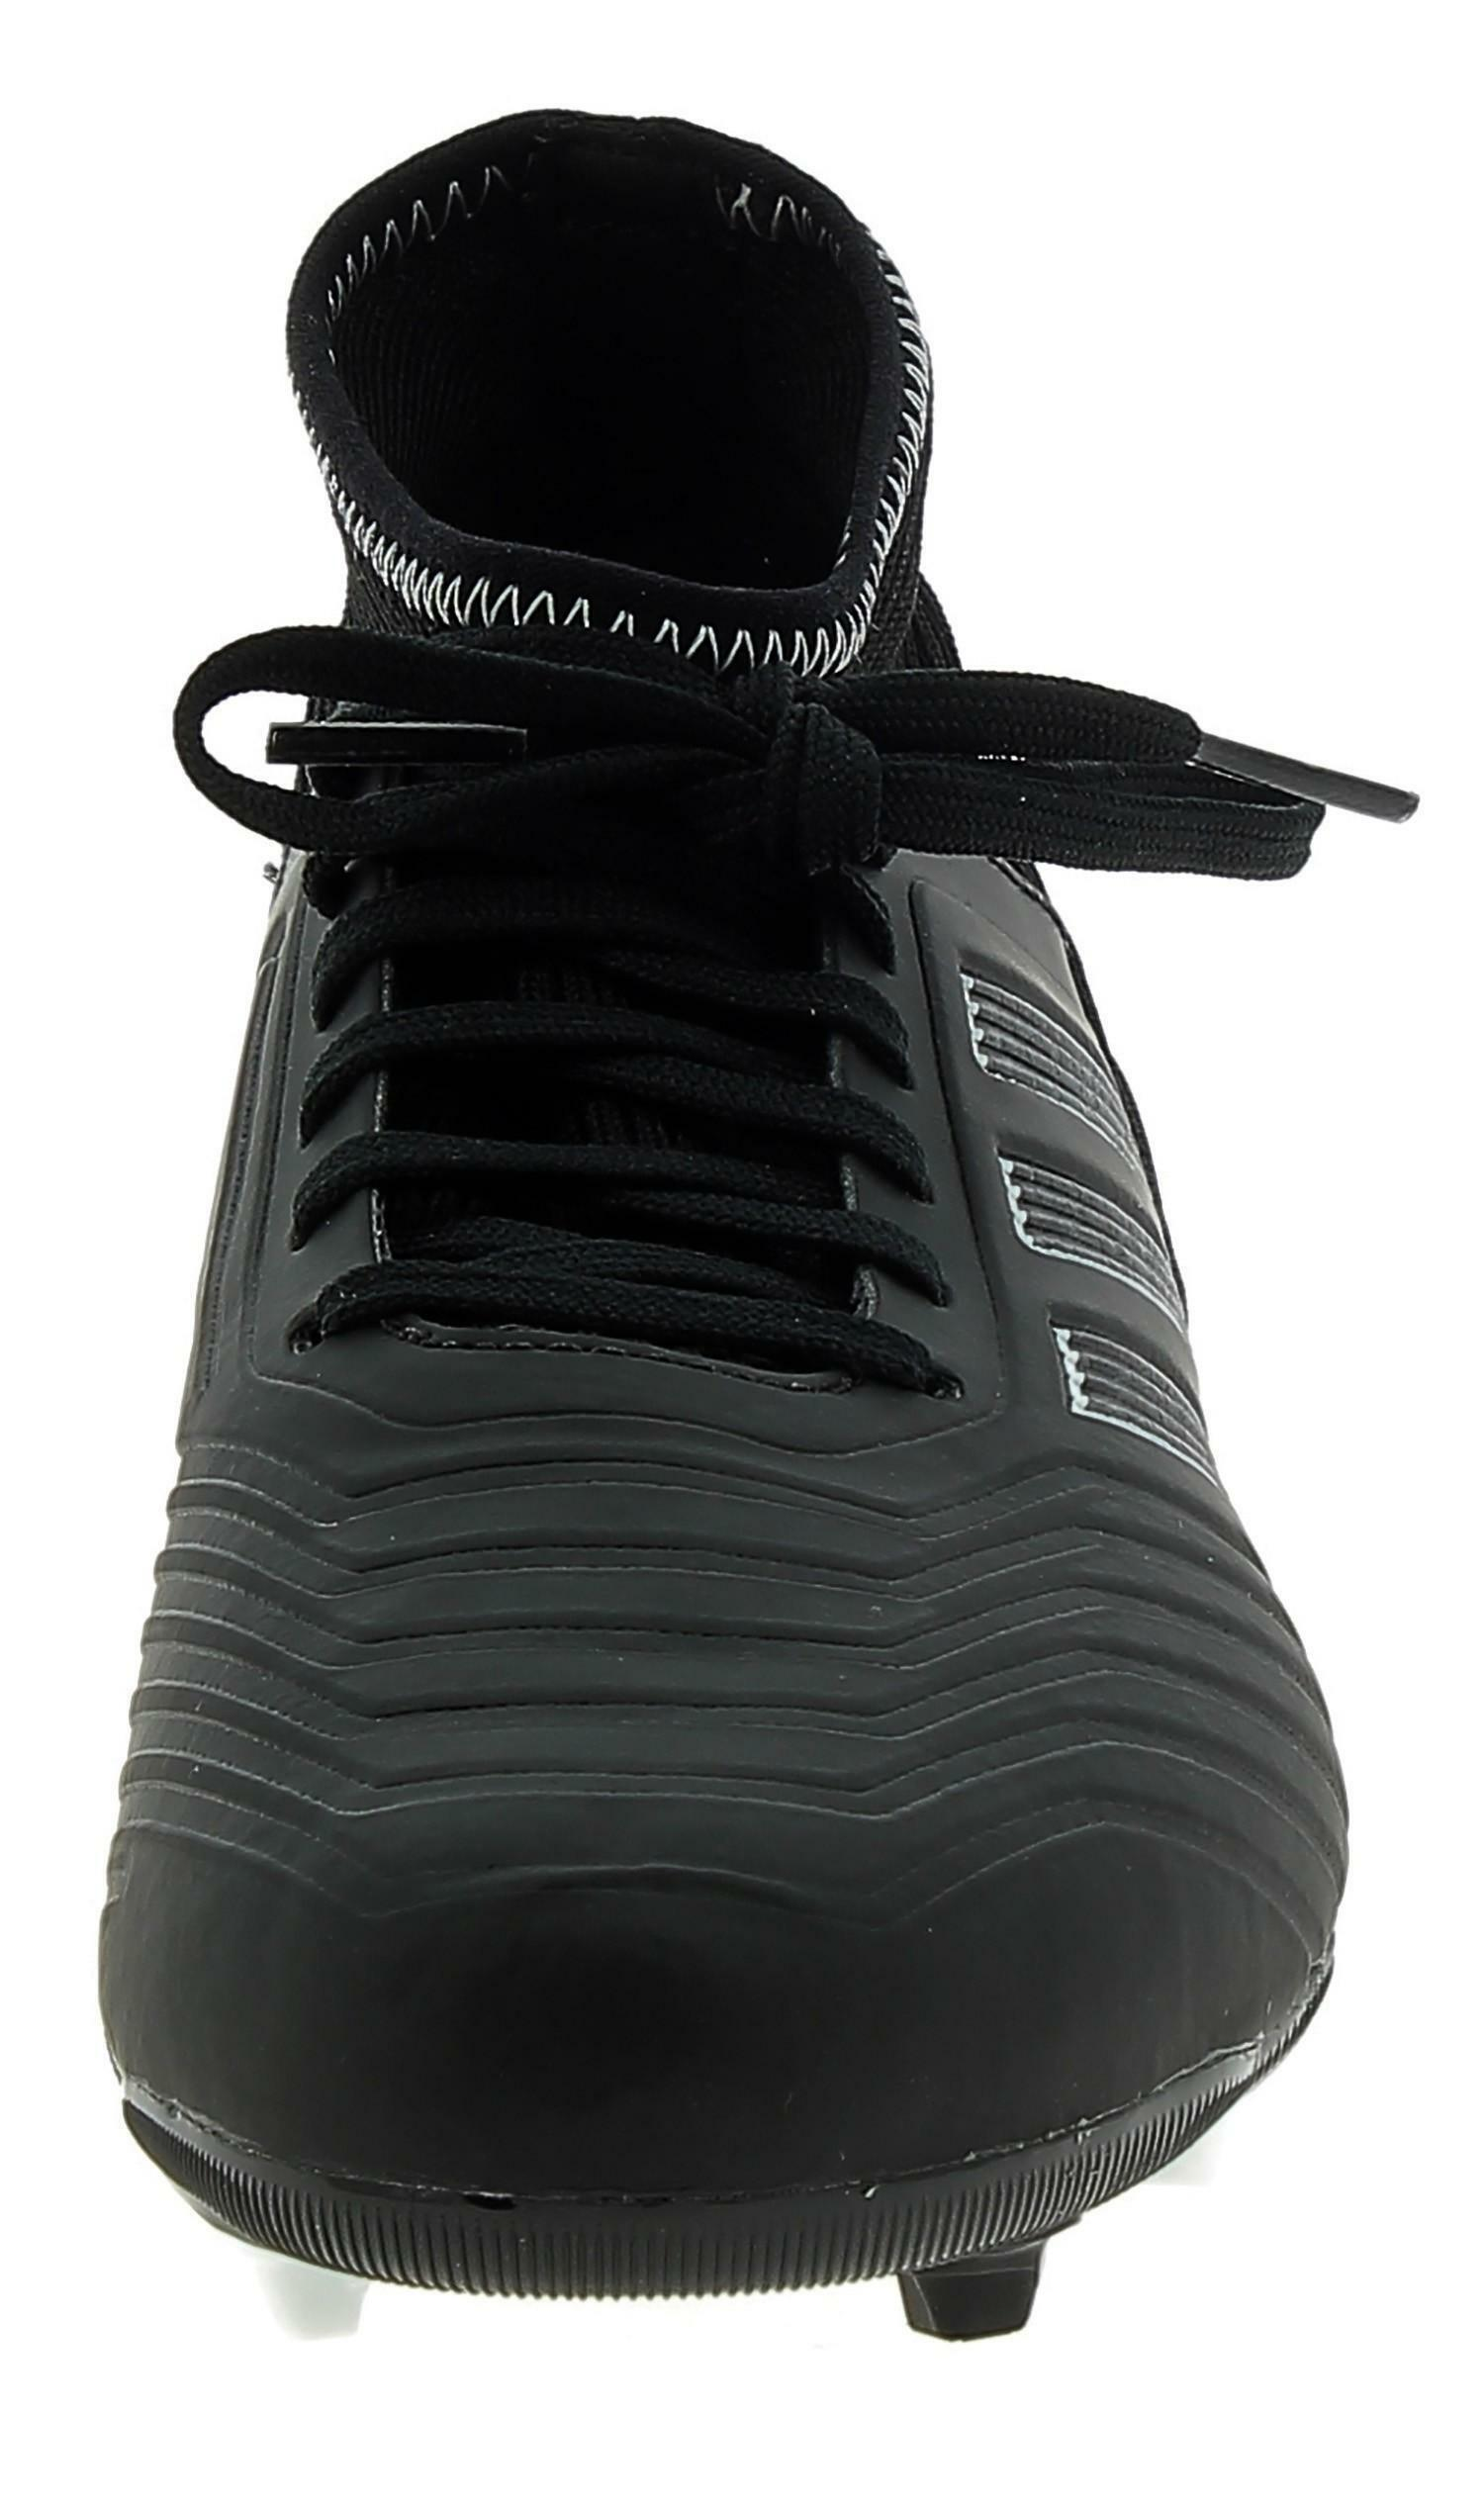 adidas adidas predator 18.3 fg scarpini calcio bambino neri db2320